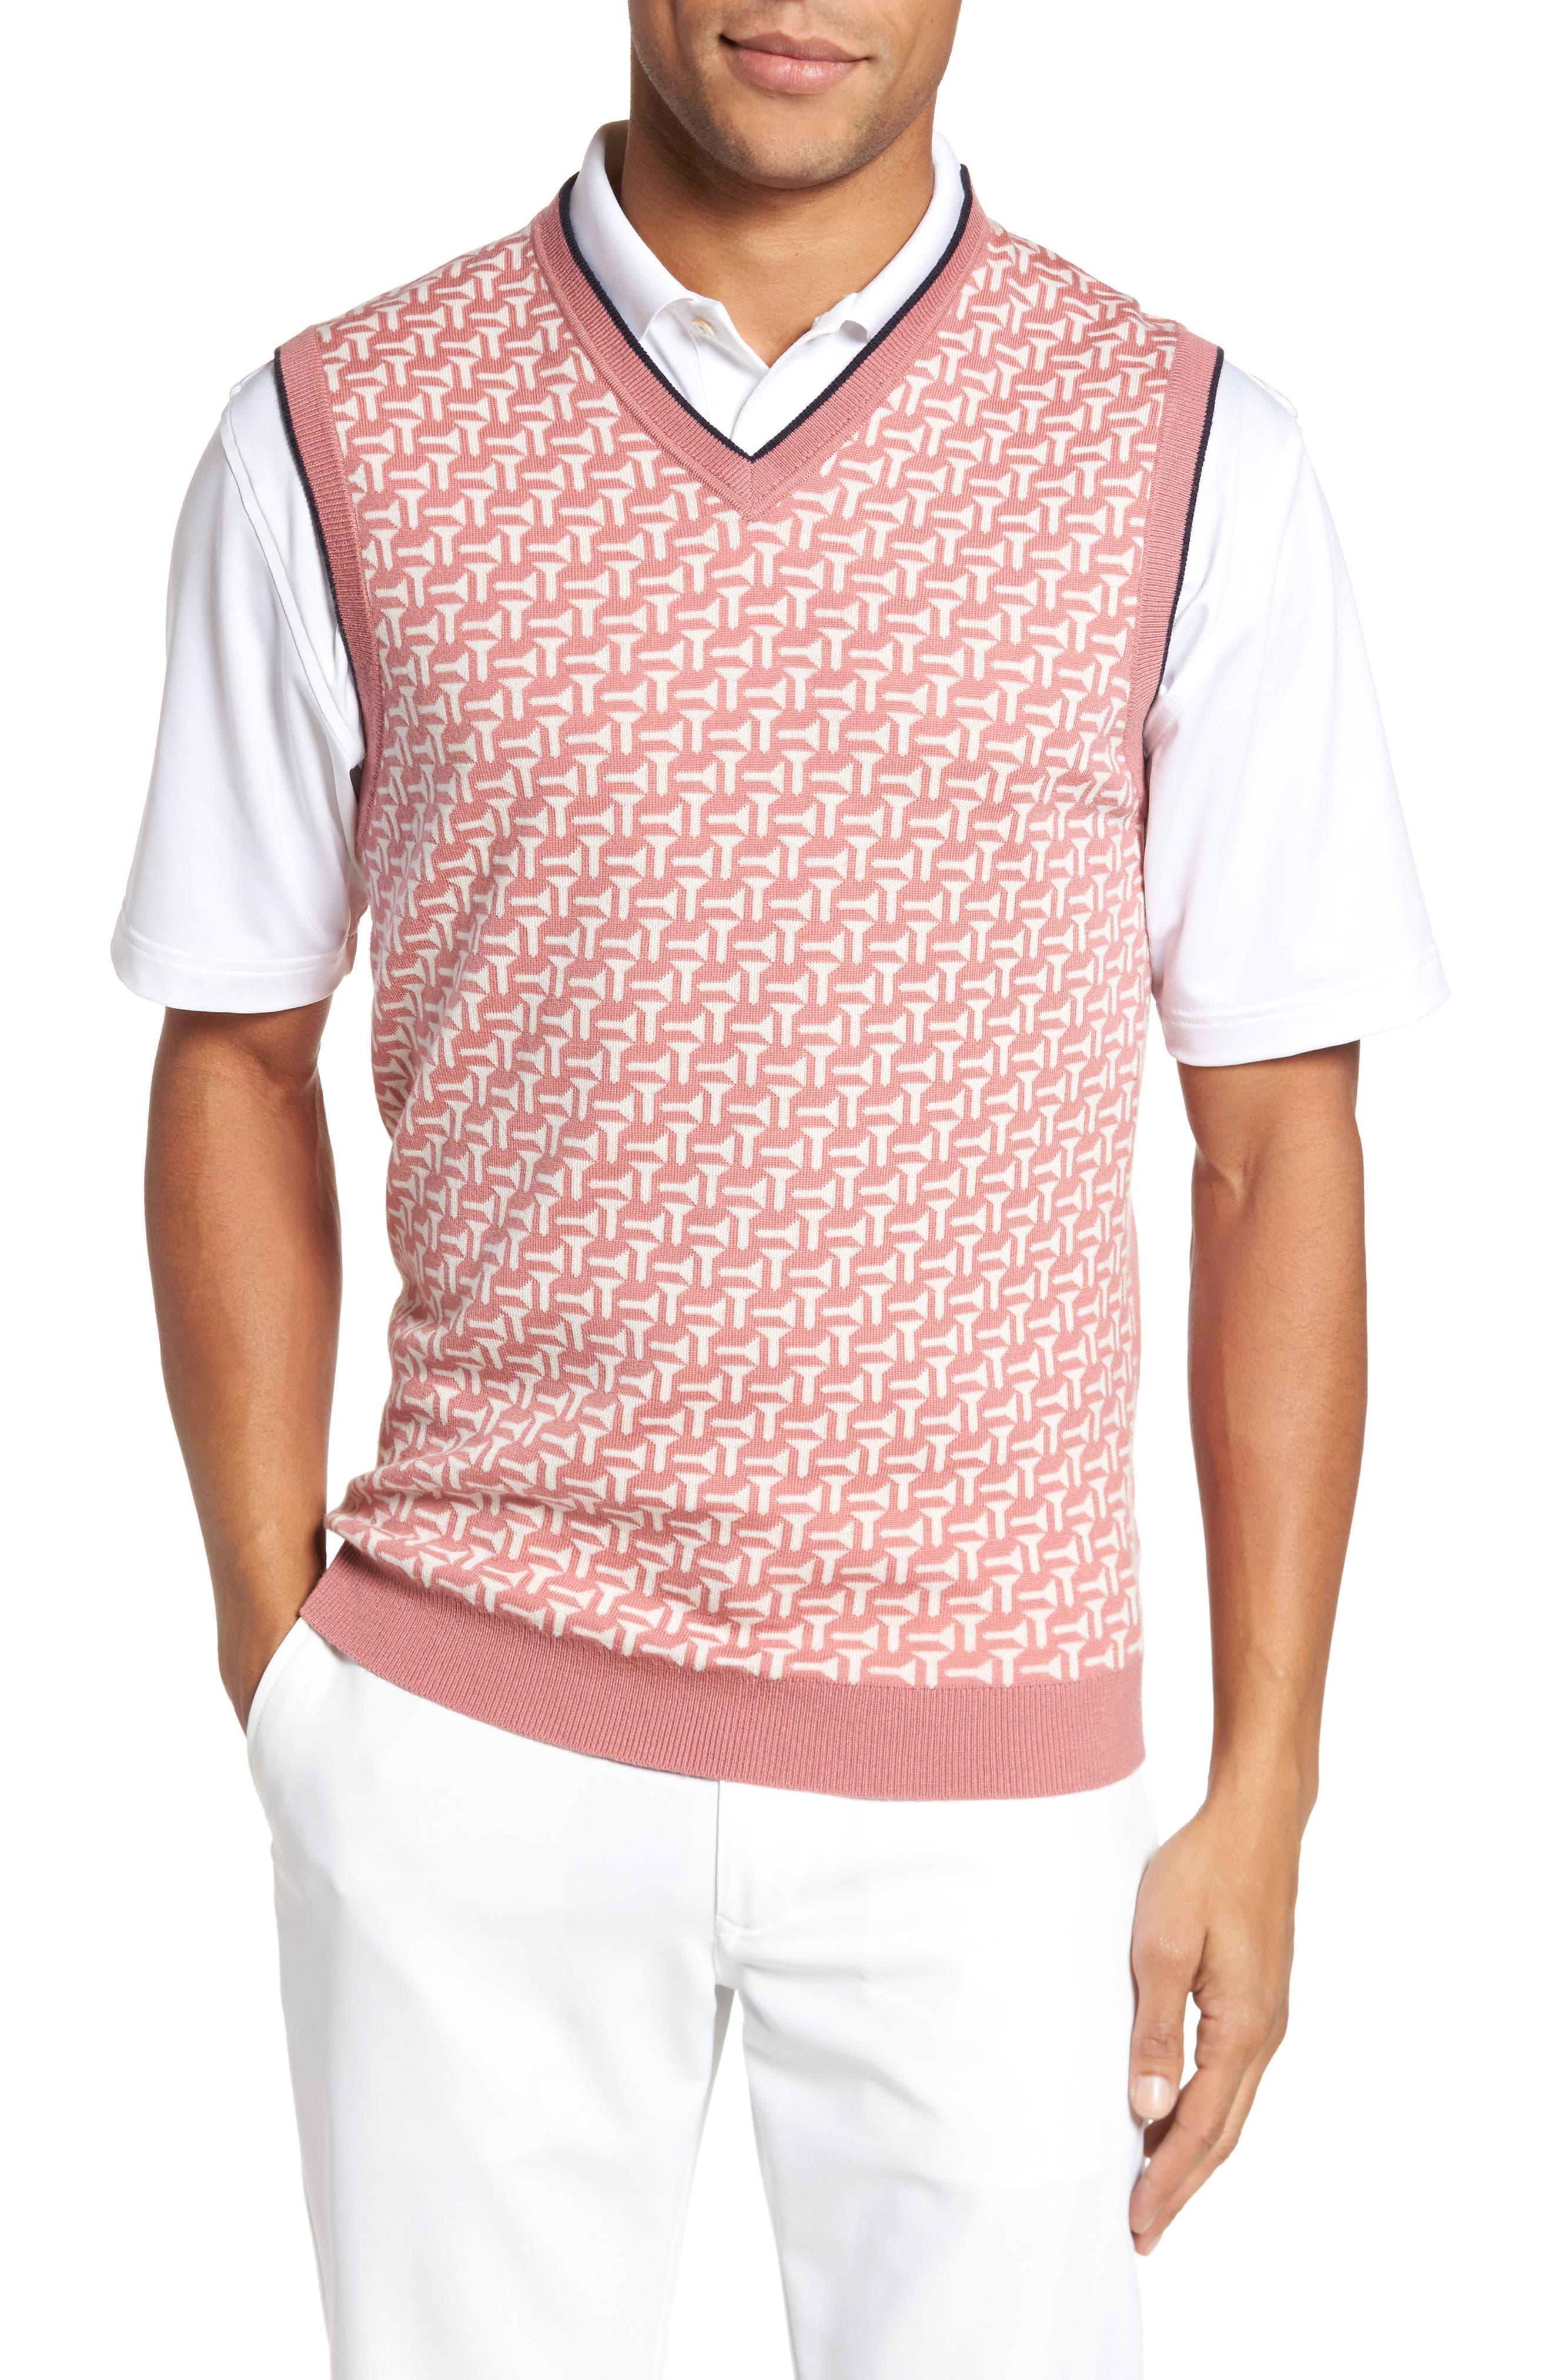 Main Image - Ted Baker London Tommas Golf Merino Sweater Vest